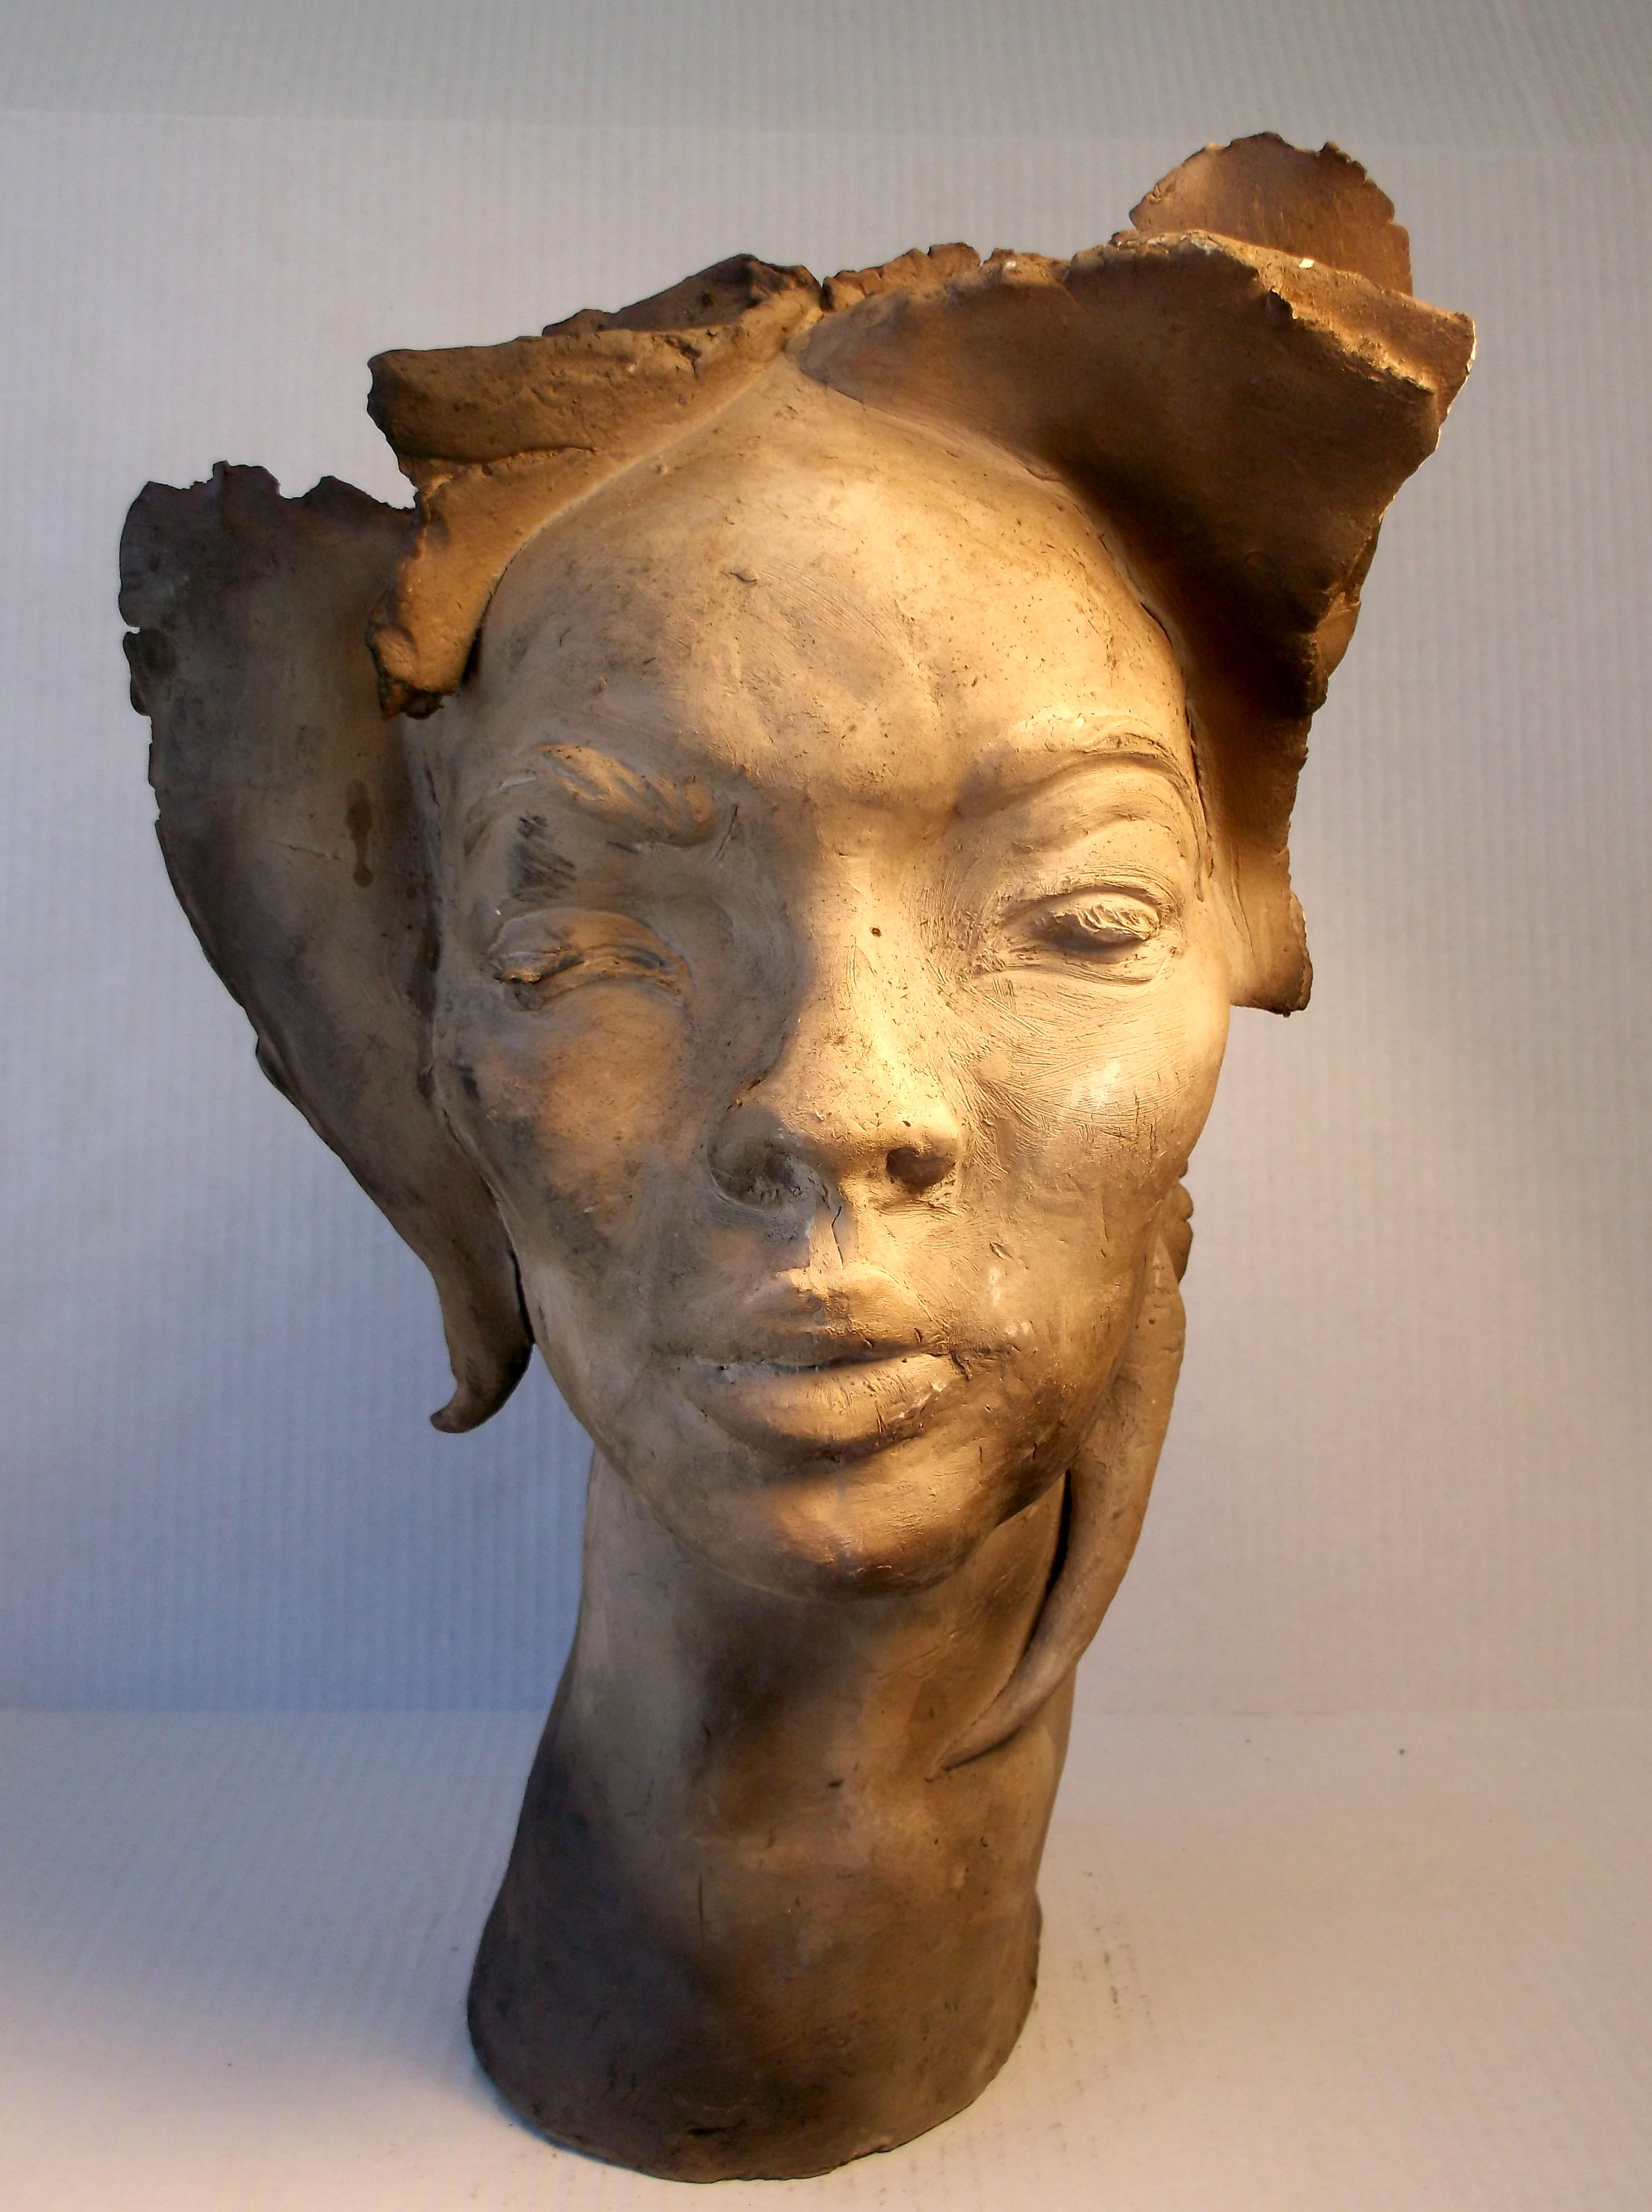 Vase head 2 (front view)